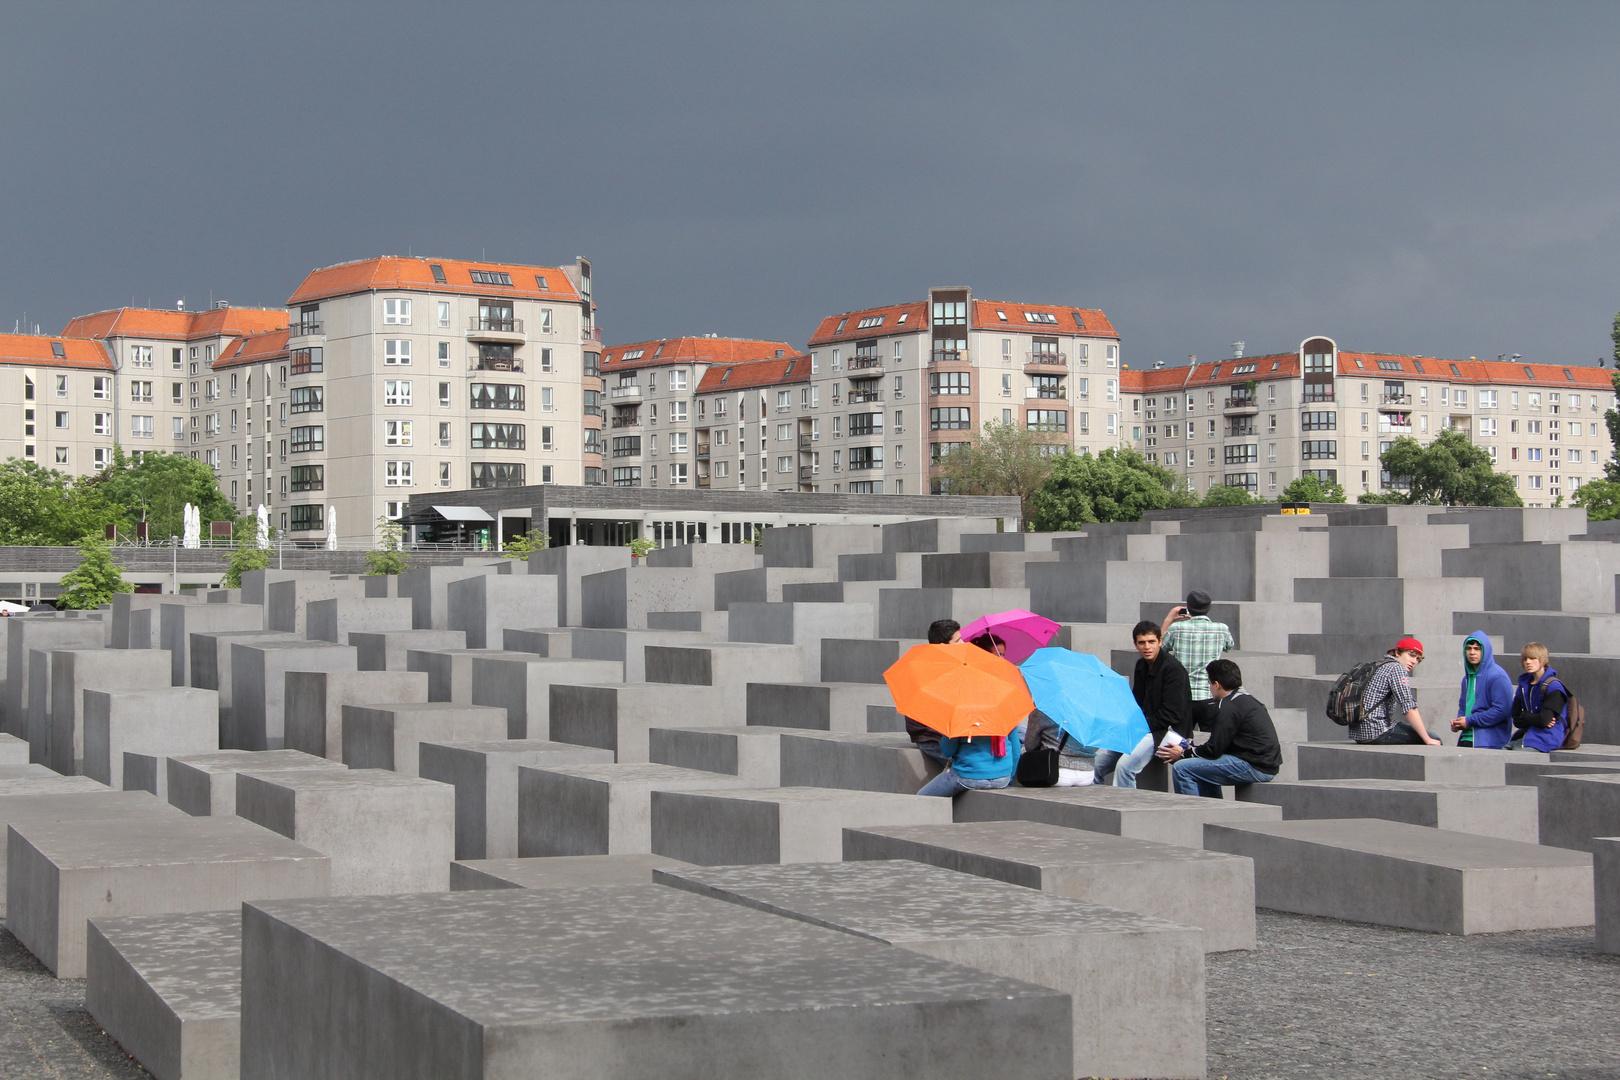 Jugendliche am Holocoast-Mahnmal in Berlin